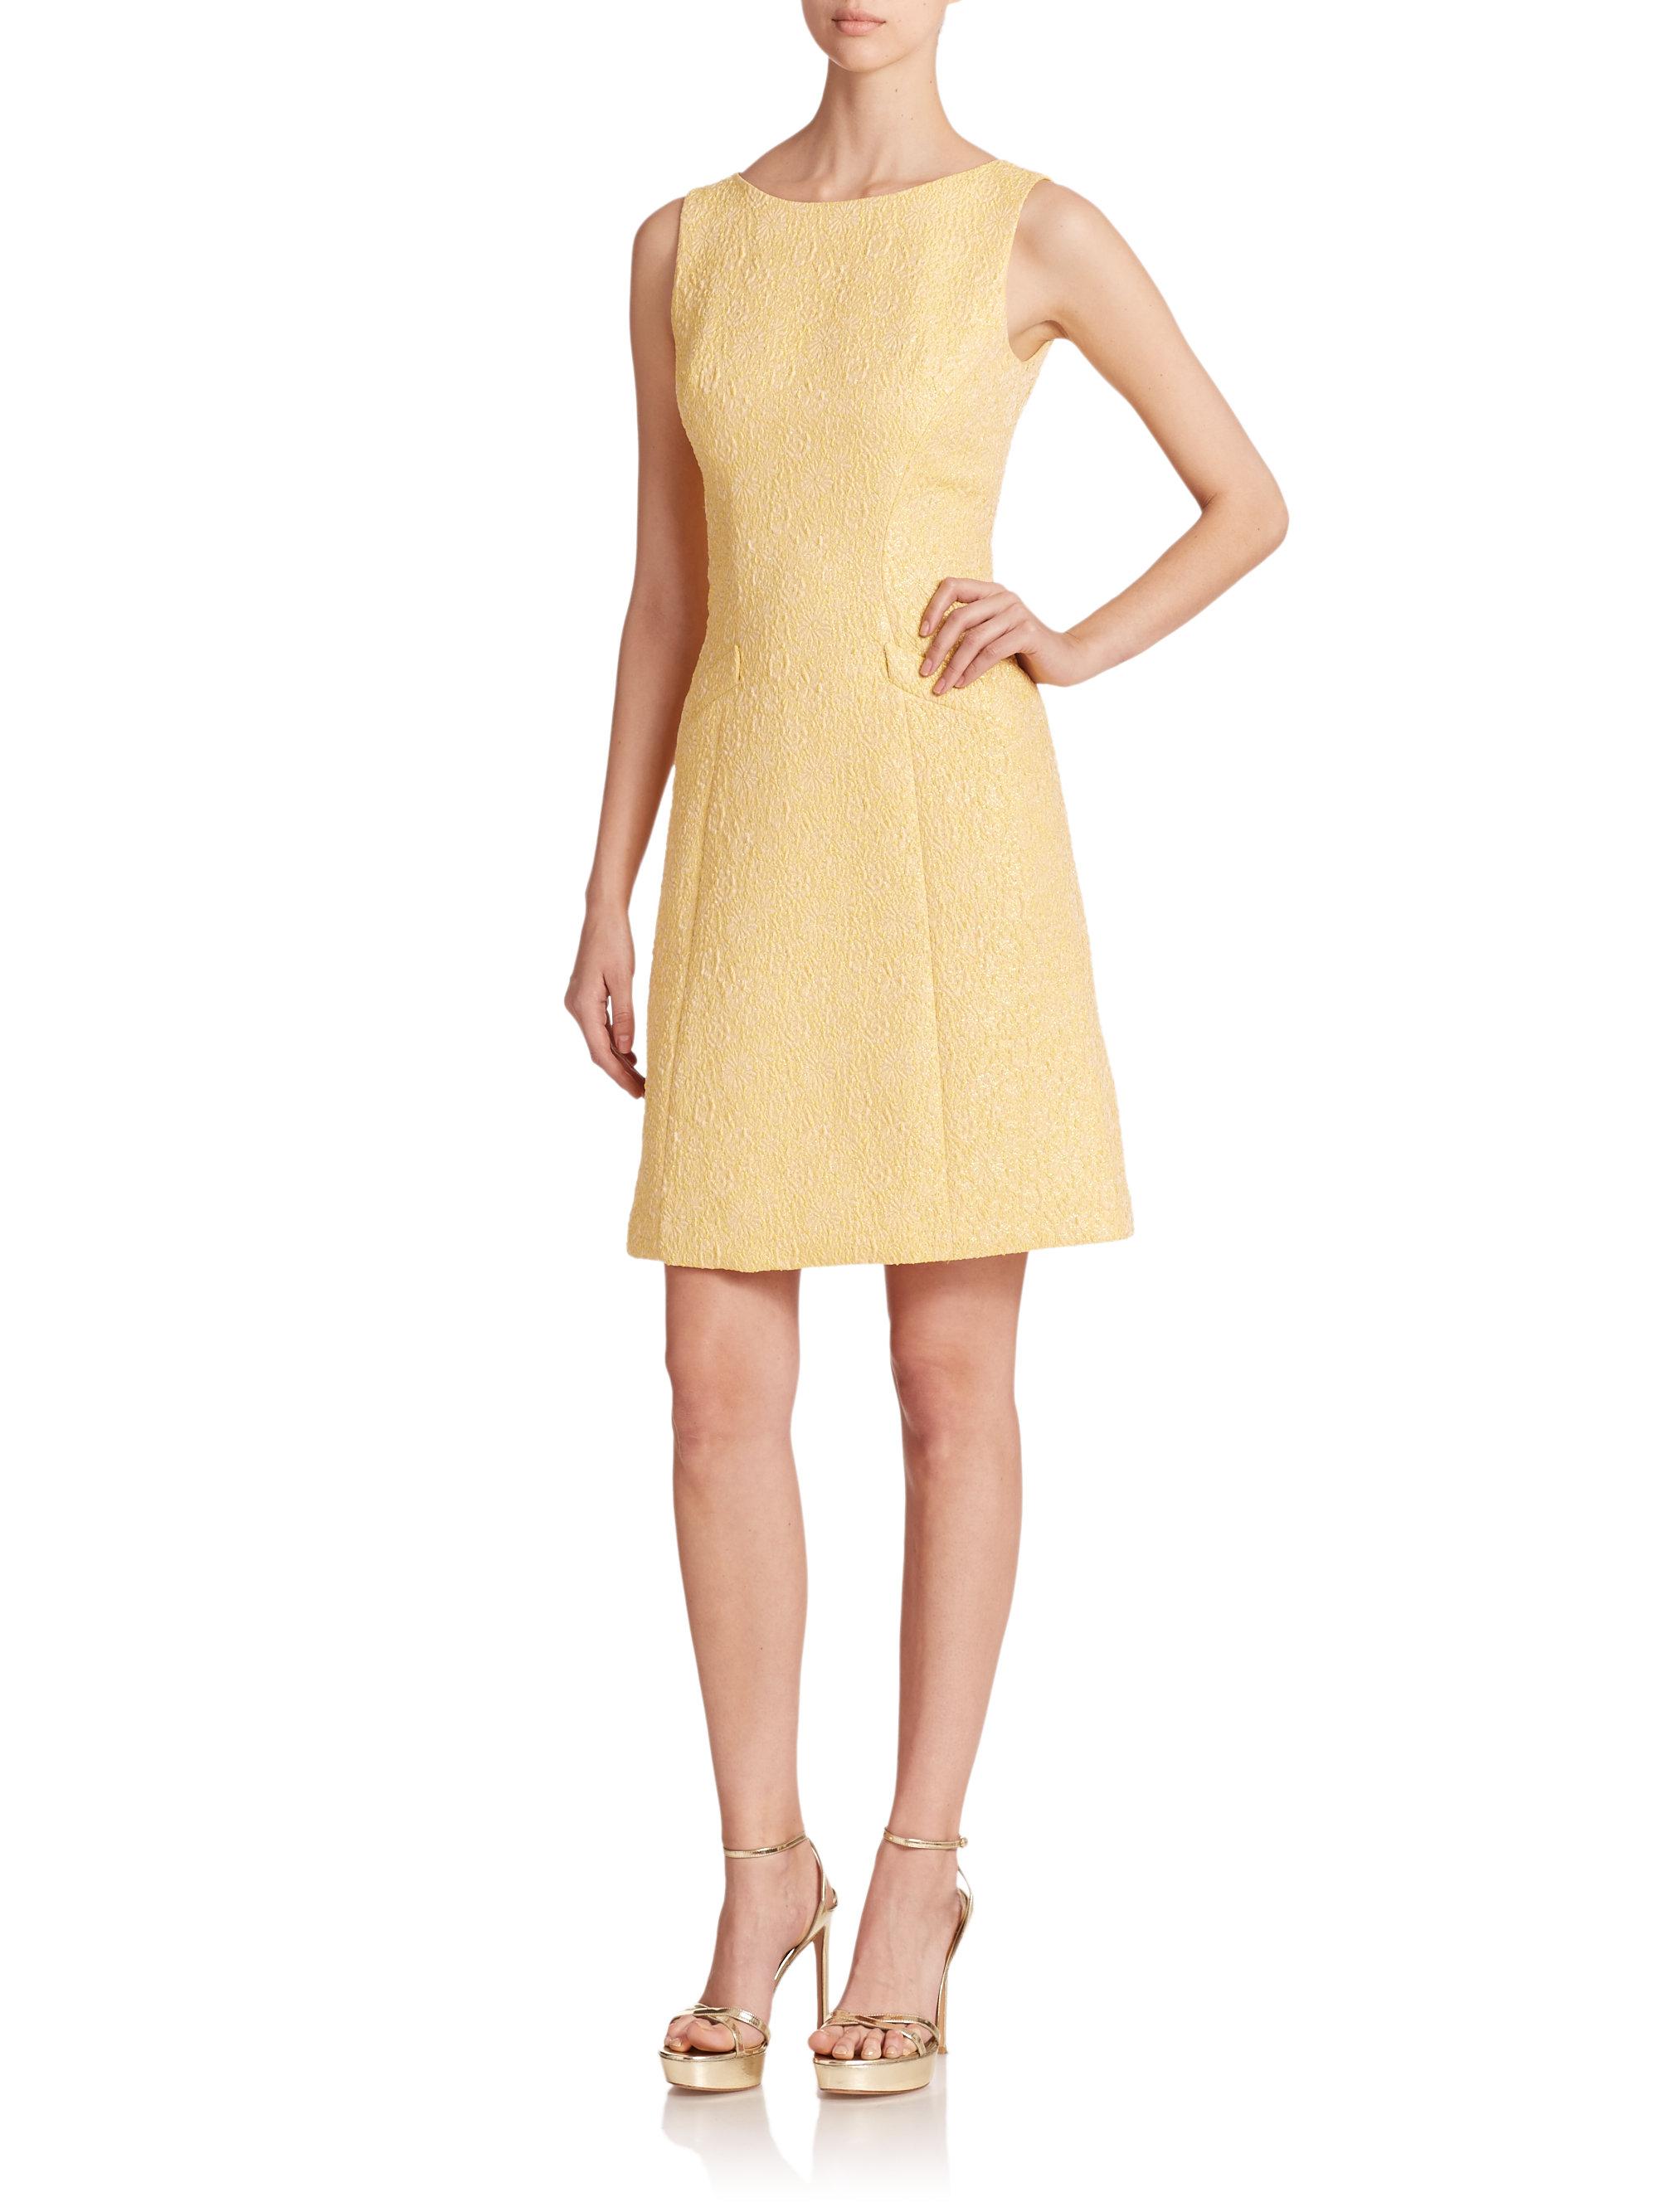 Lyst - Theia Jacquard Sleeveless Dress in Yellow